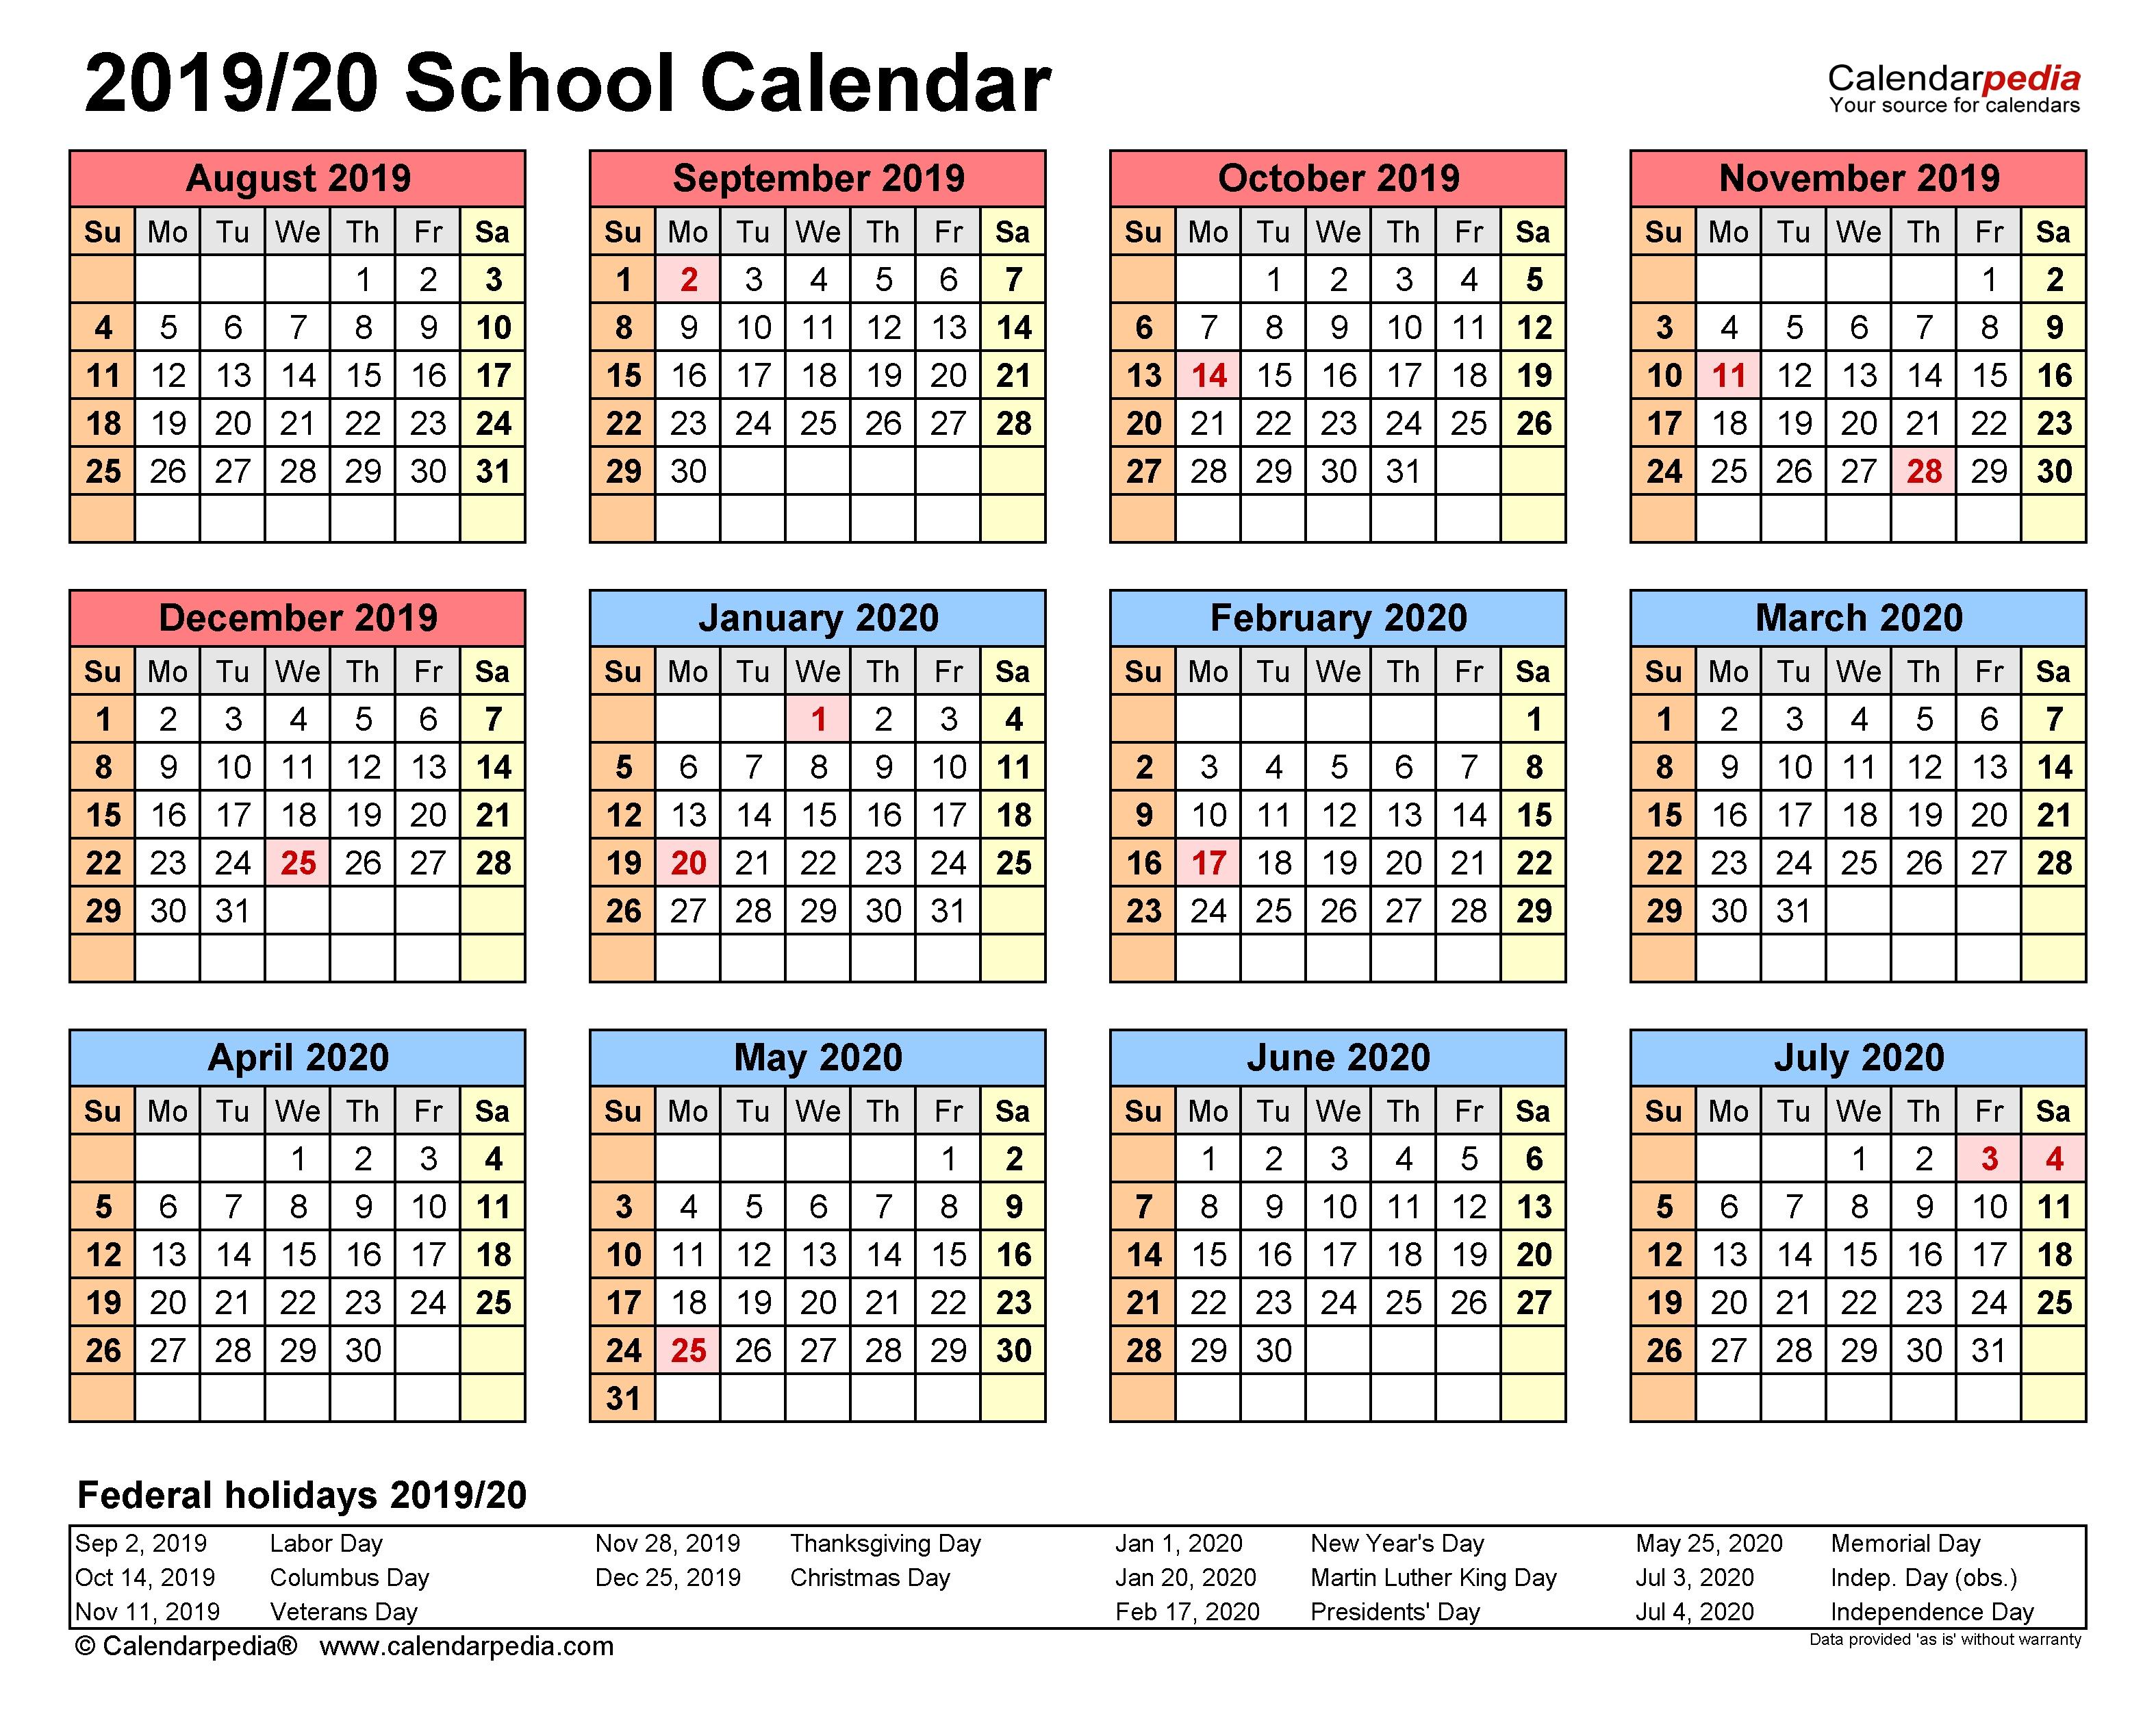 School Calendars 2019/2020 - Free Printable Word Templates